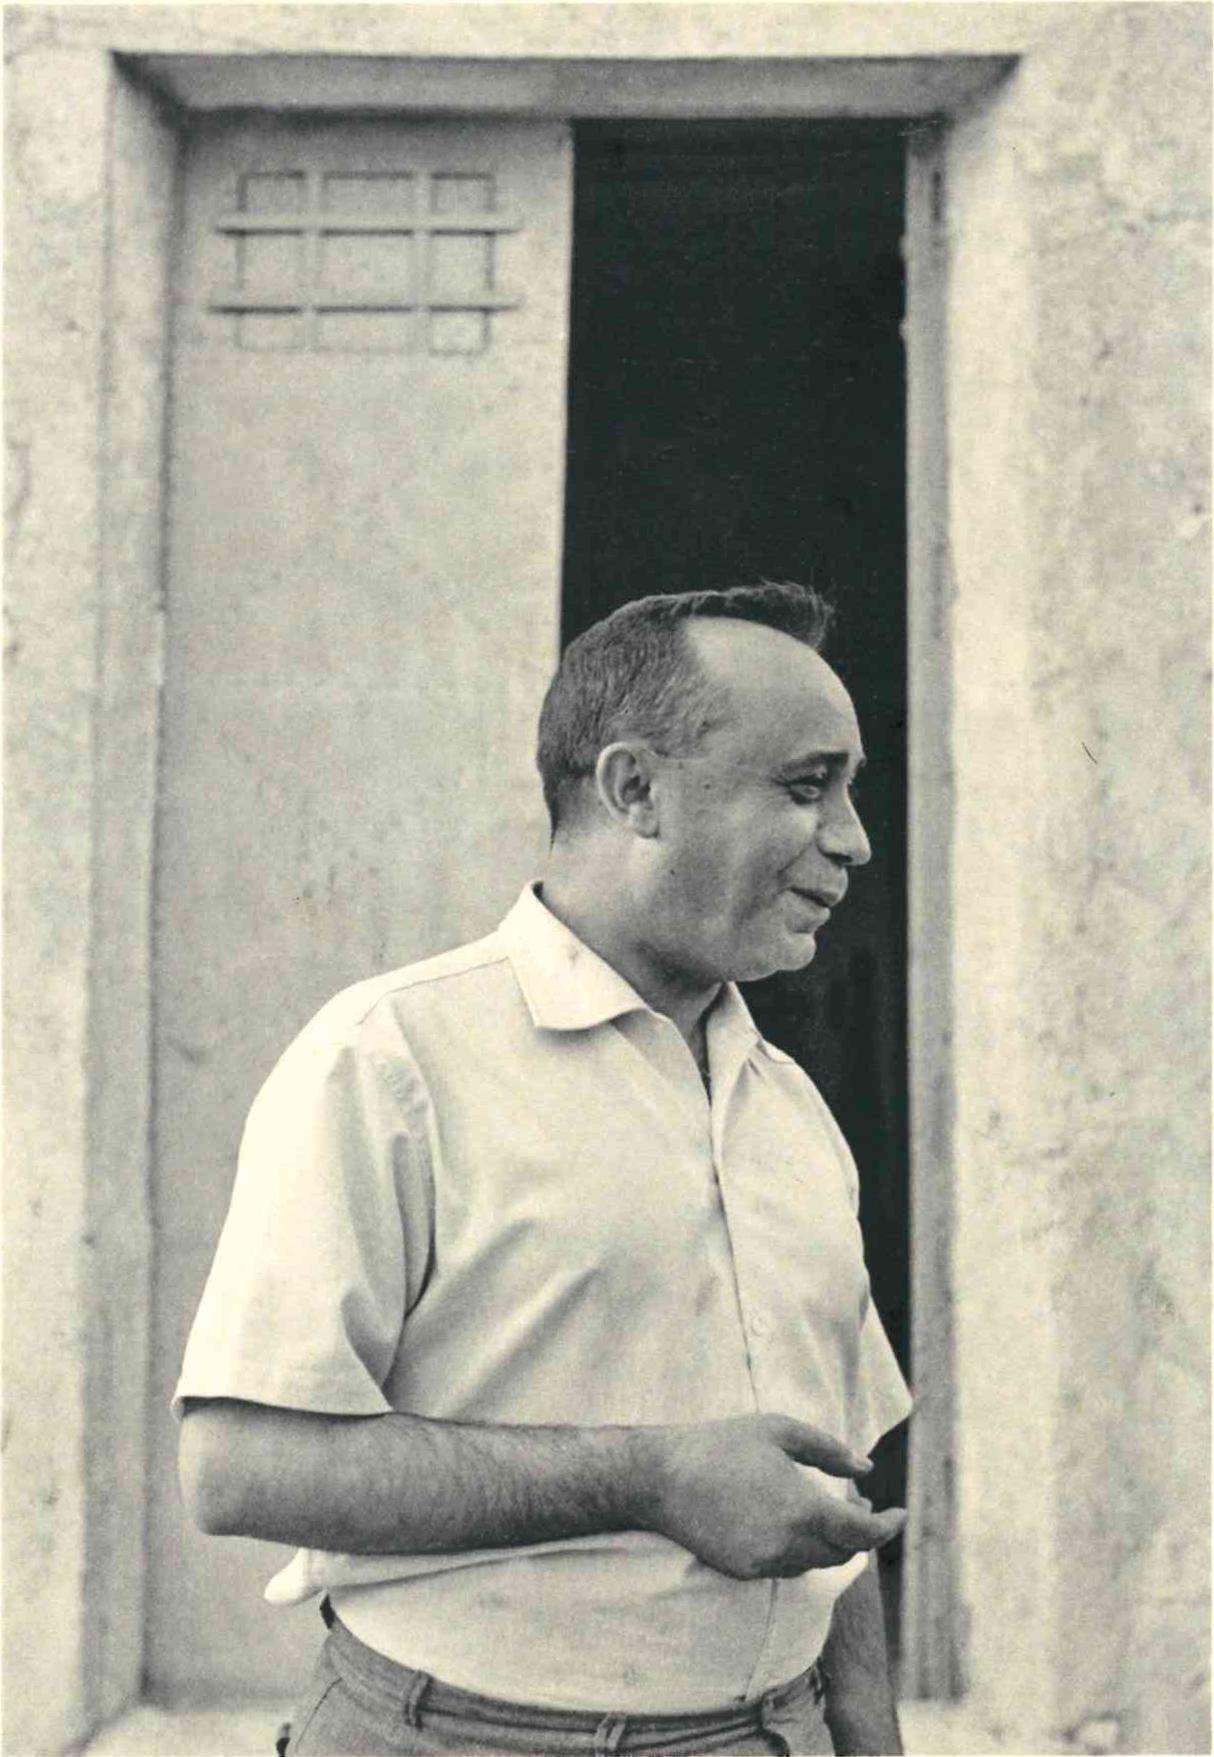 Leonardo Sciascia - fotografia di Ferdinando Scianna